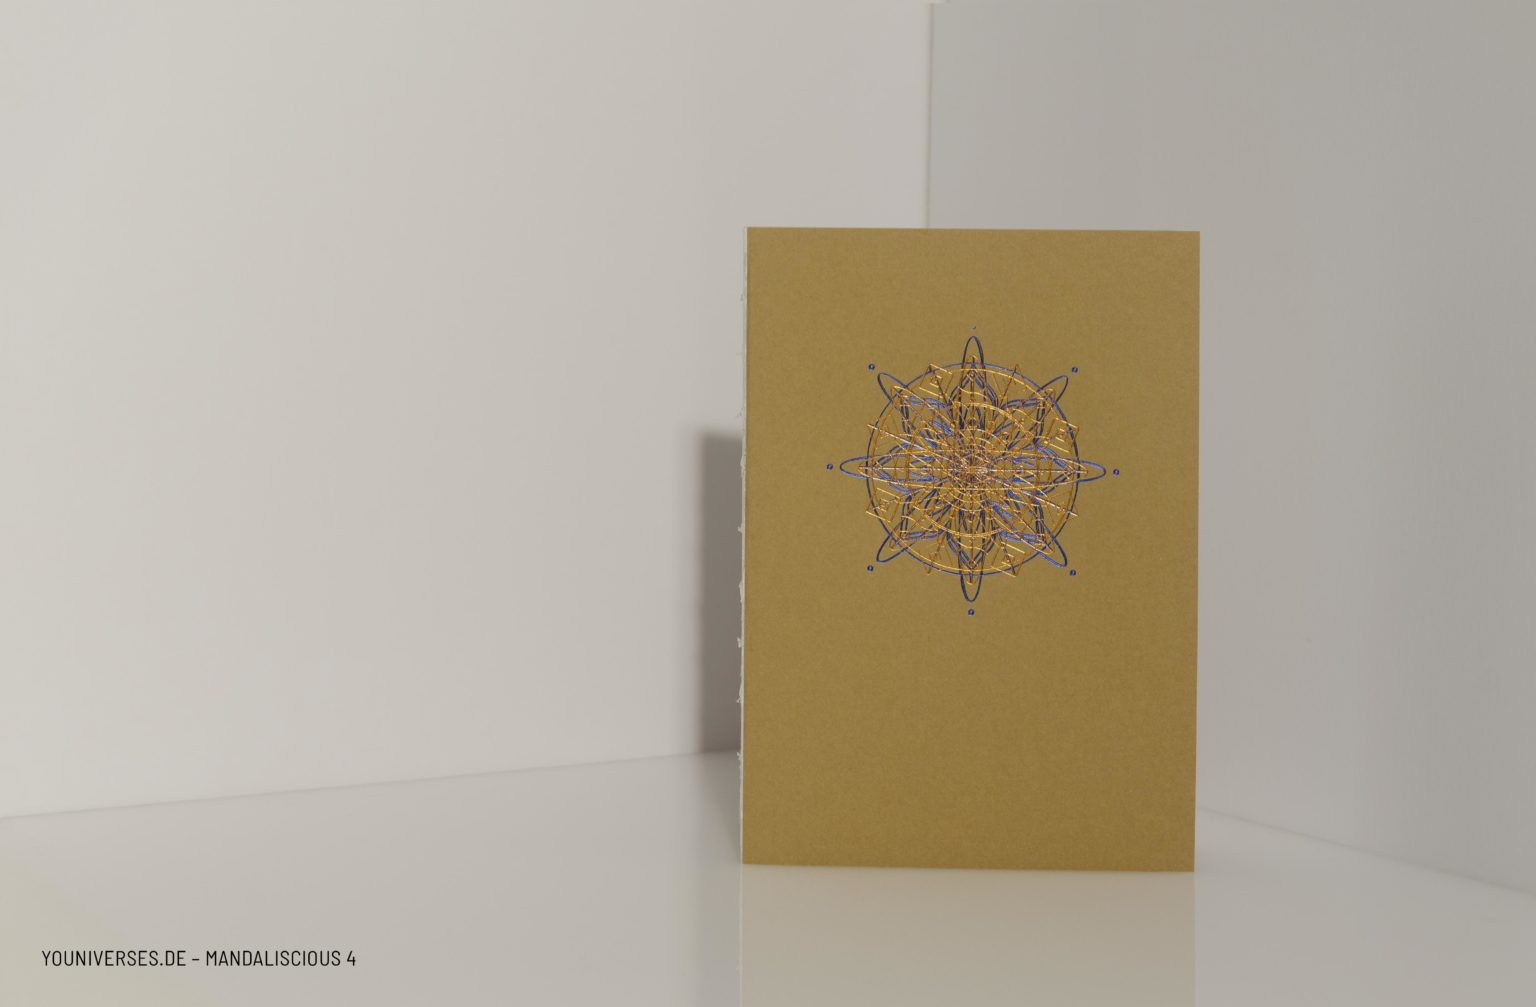 Youniverses, Reihe: mandaliscious Design-N°.: 4 Farben: Kupfer & Blau, Yournal, Journal, Diary, Bulletjournal, Tagebuch, Skizzenbuch, Veredelung, DIY, Handmade, Papeterie.